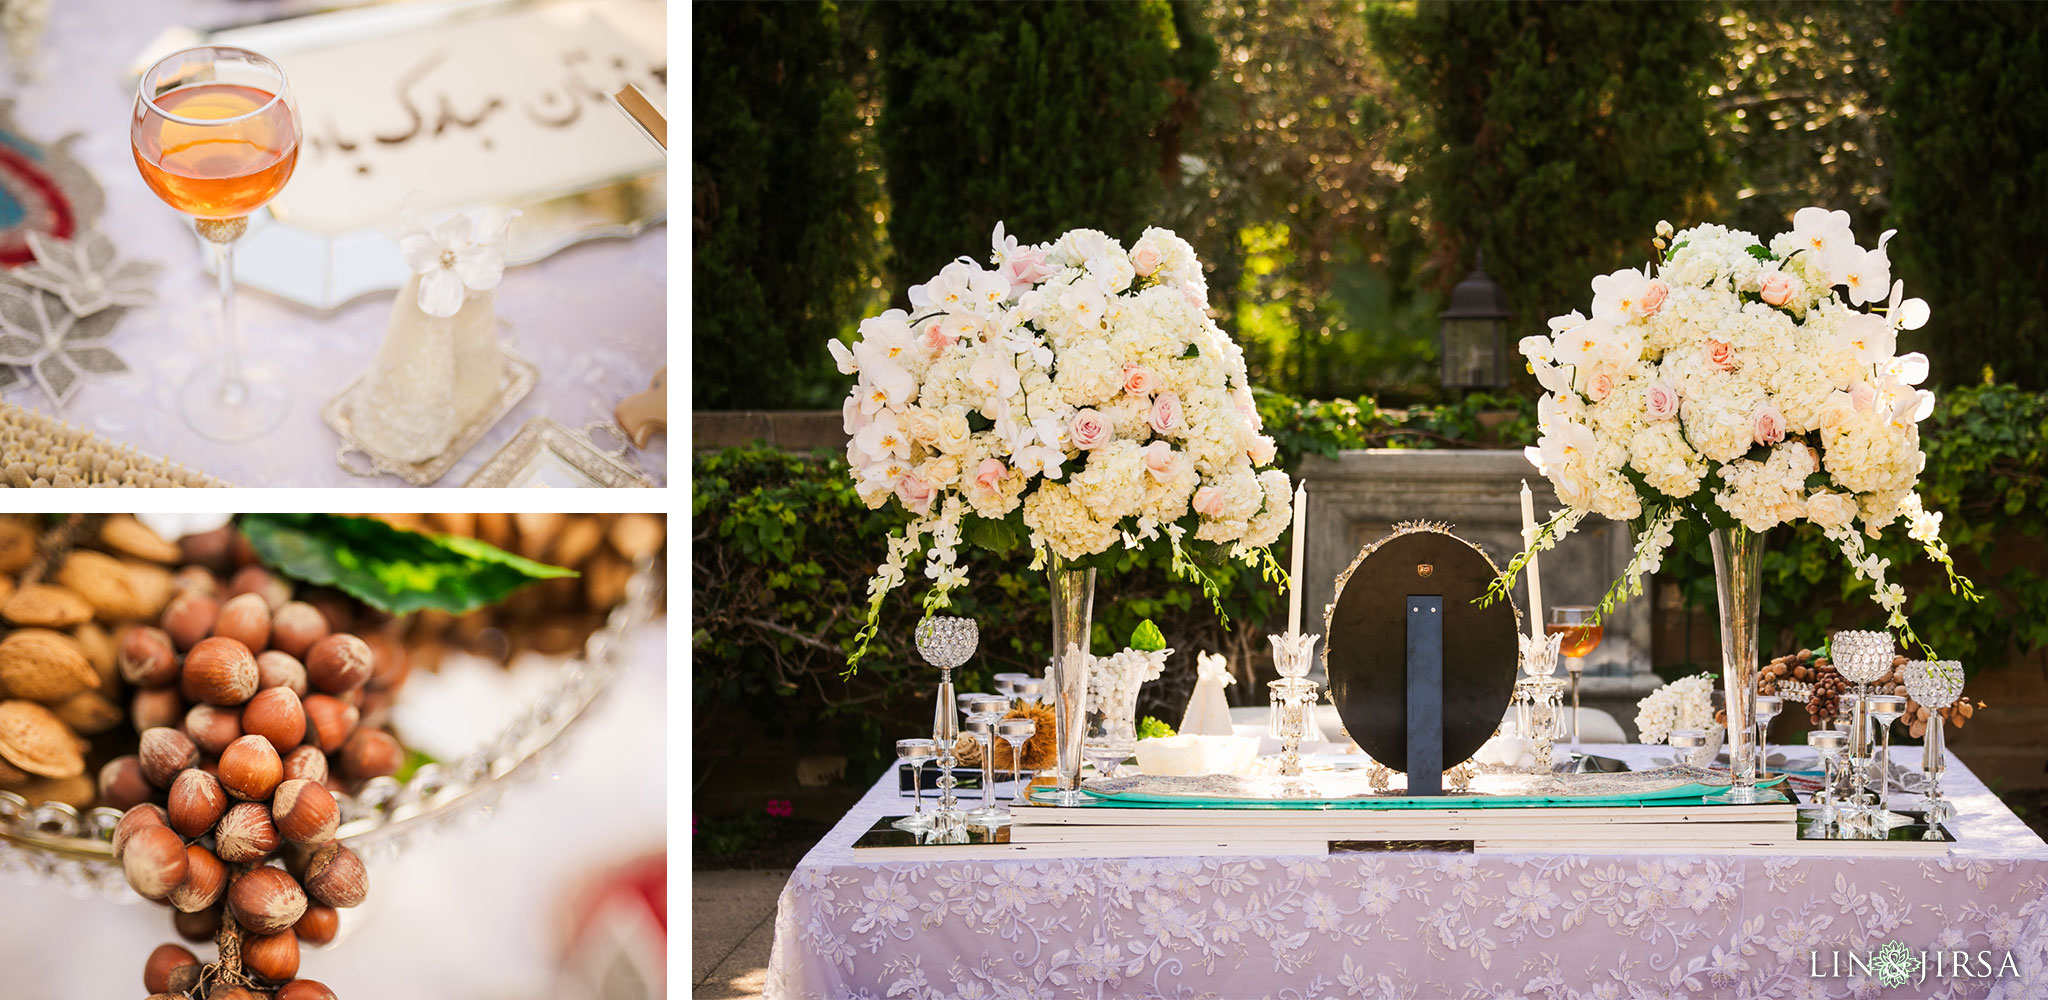 028 estancia la jolla hotel spa persian sofreh wedding ceremony photography